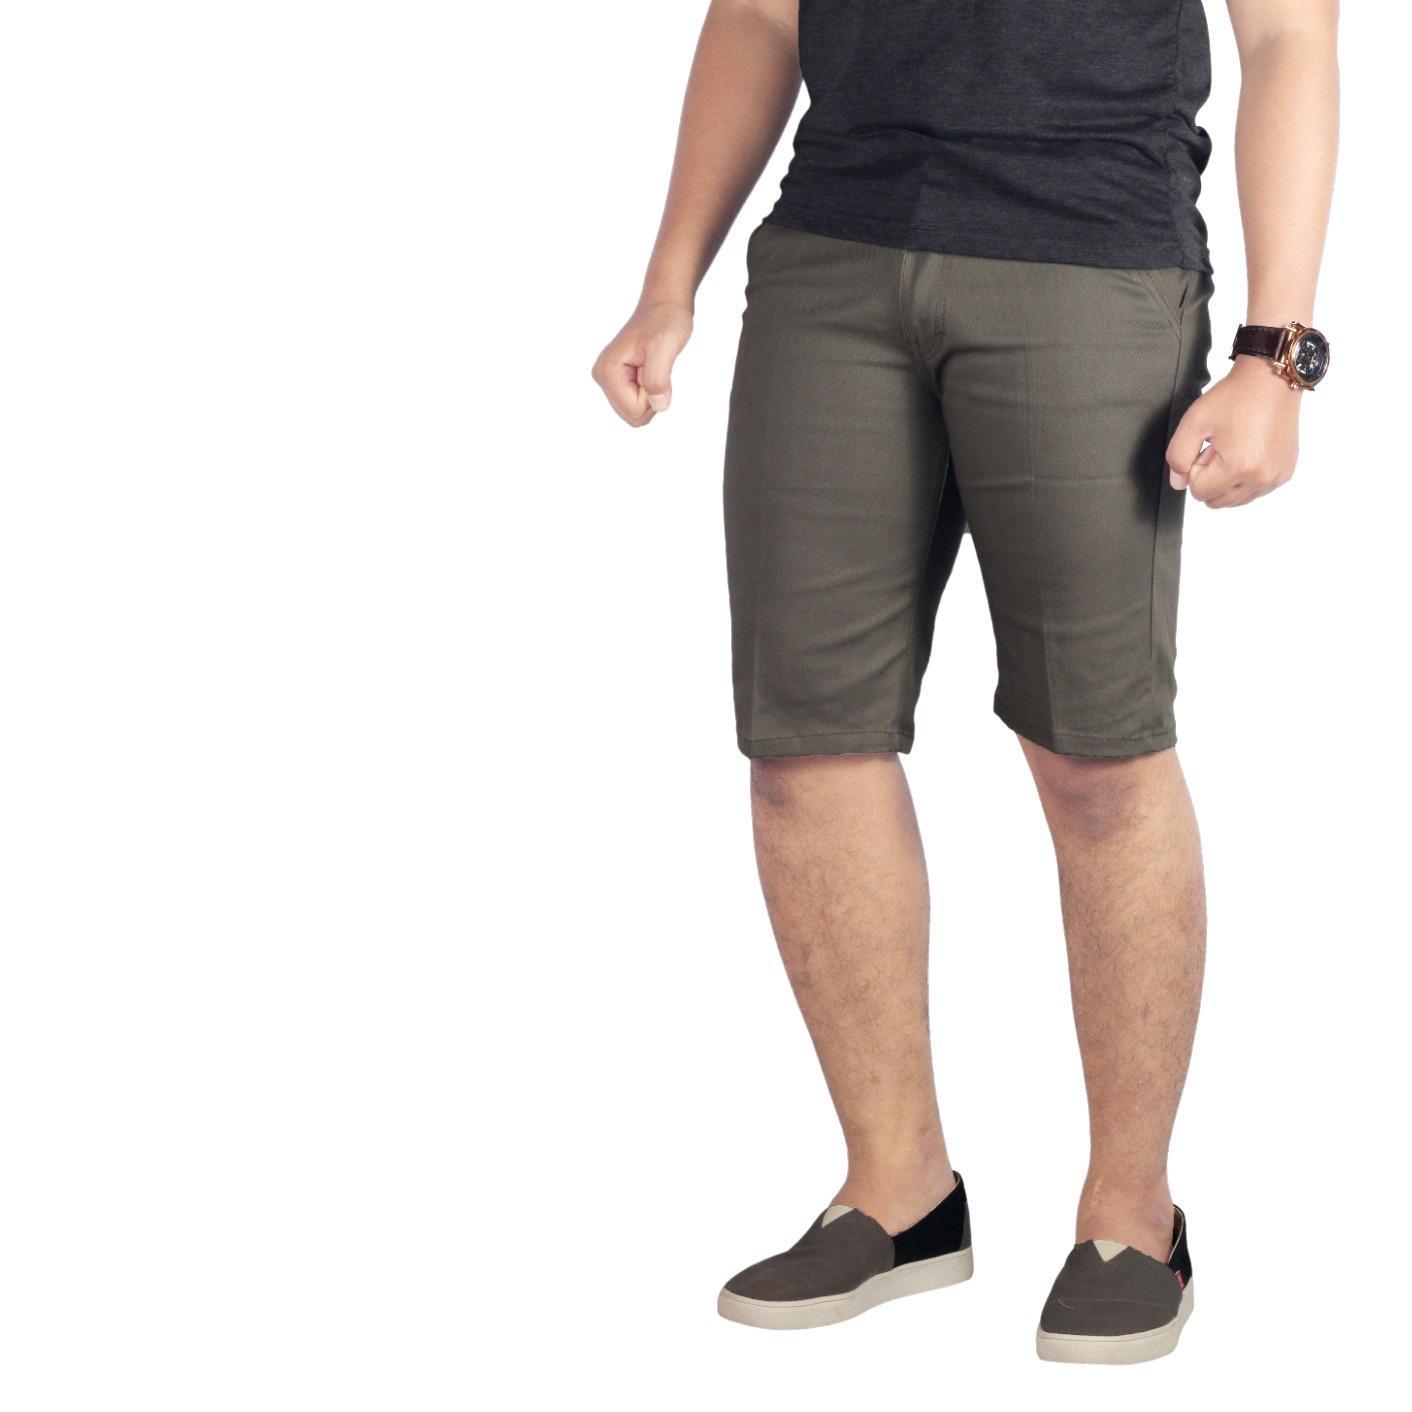 Bsg_Fashion1 Celana Pendek Hitam Polos Distro Import/ Celana Skinny/Celana Pants/Celana Santai/Celana Casual/Celana Motif/Celana Polos/Celana Pria/Celana Cino/Celana Pantai/Celana Denim/Celana Jeans / CELENA ARMY/ CELANA PANTAI  GN 5539